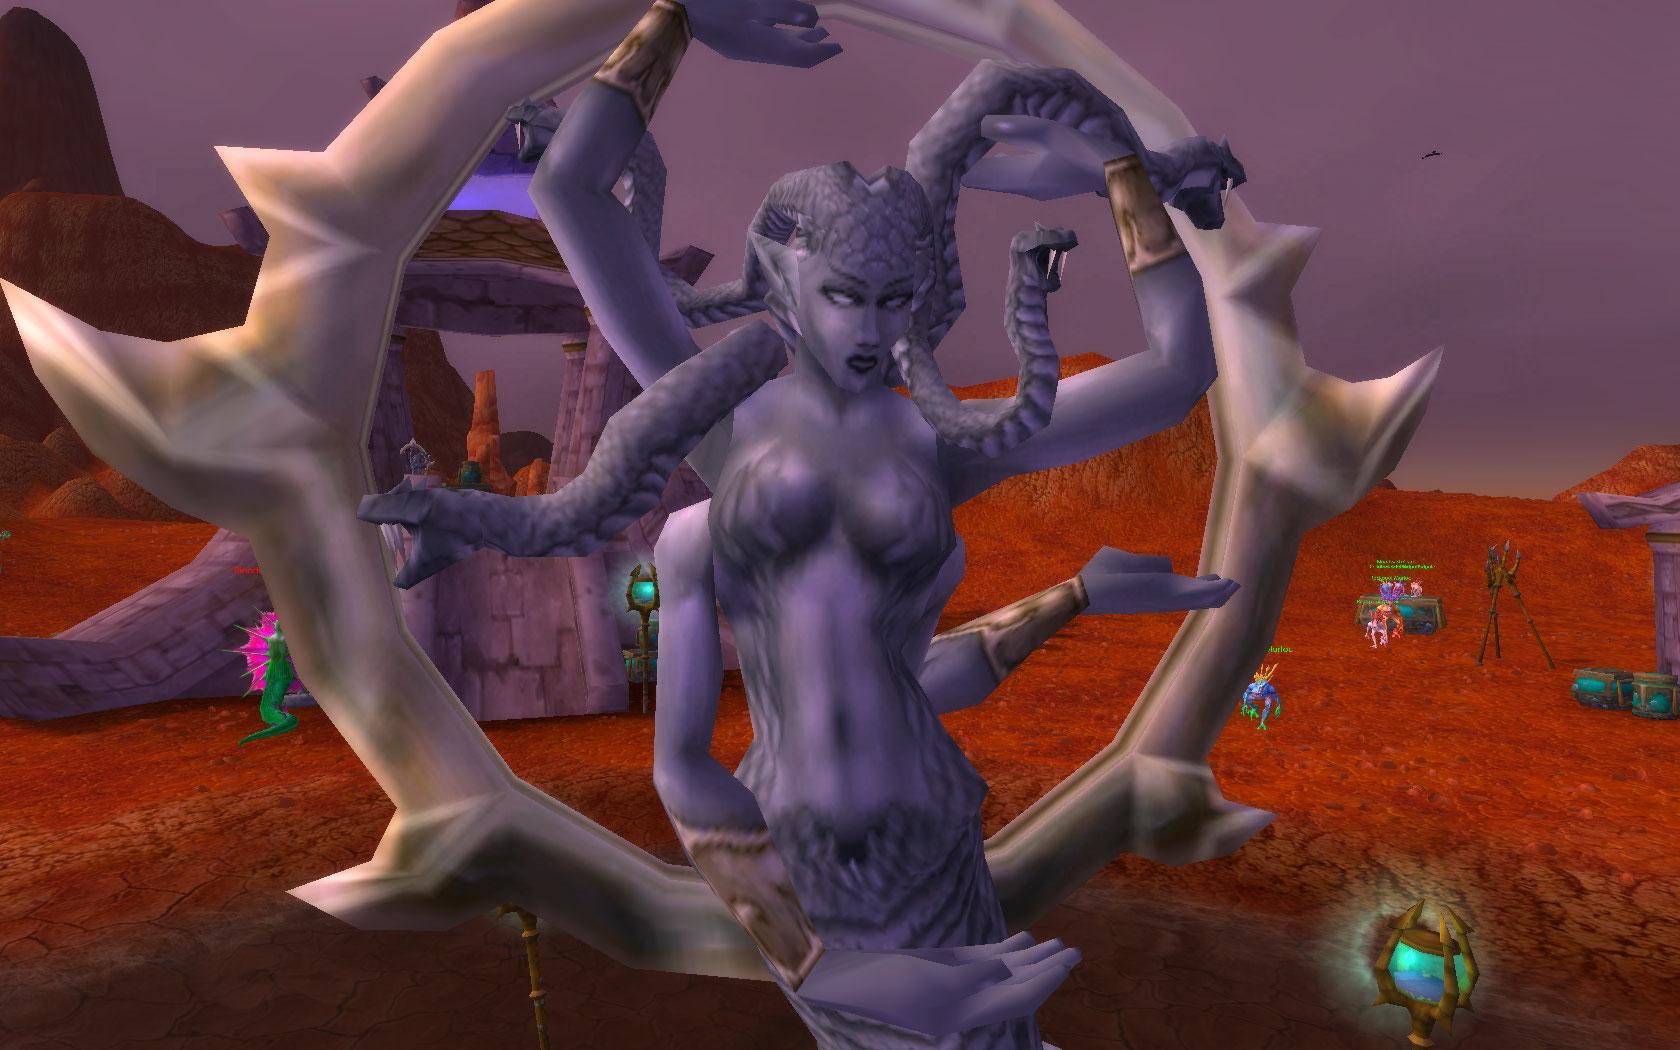 Warcraft boob fucks scenes